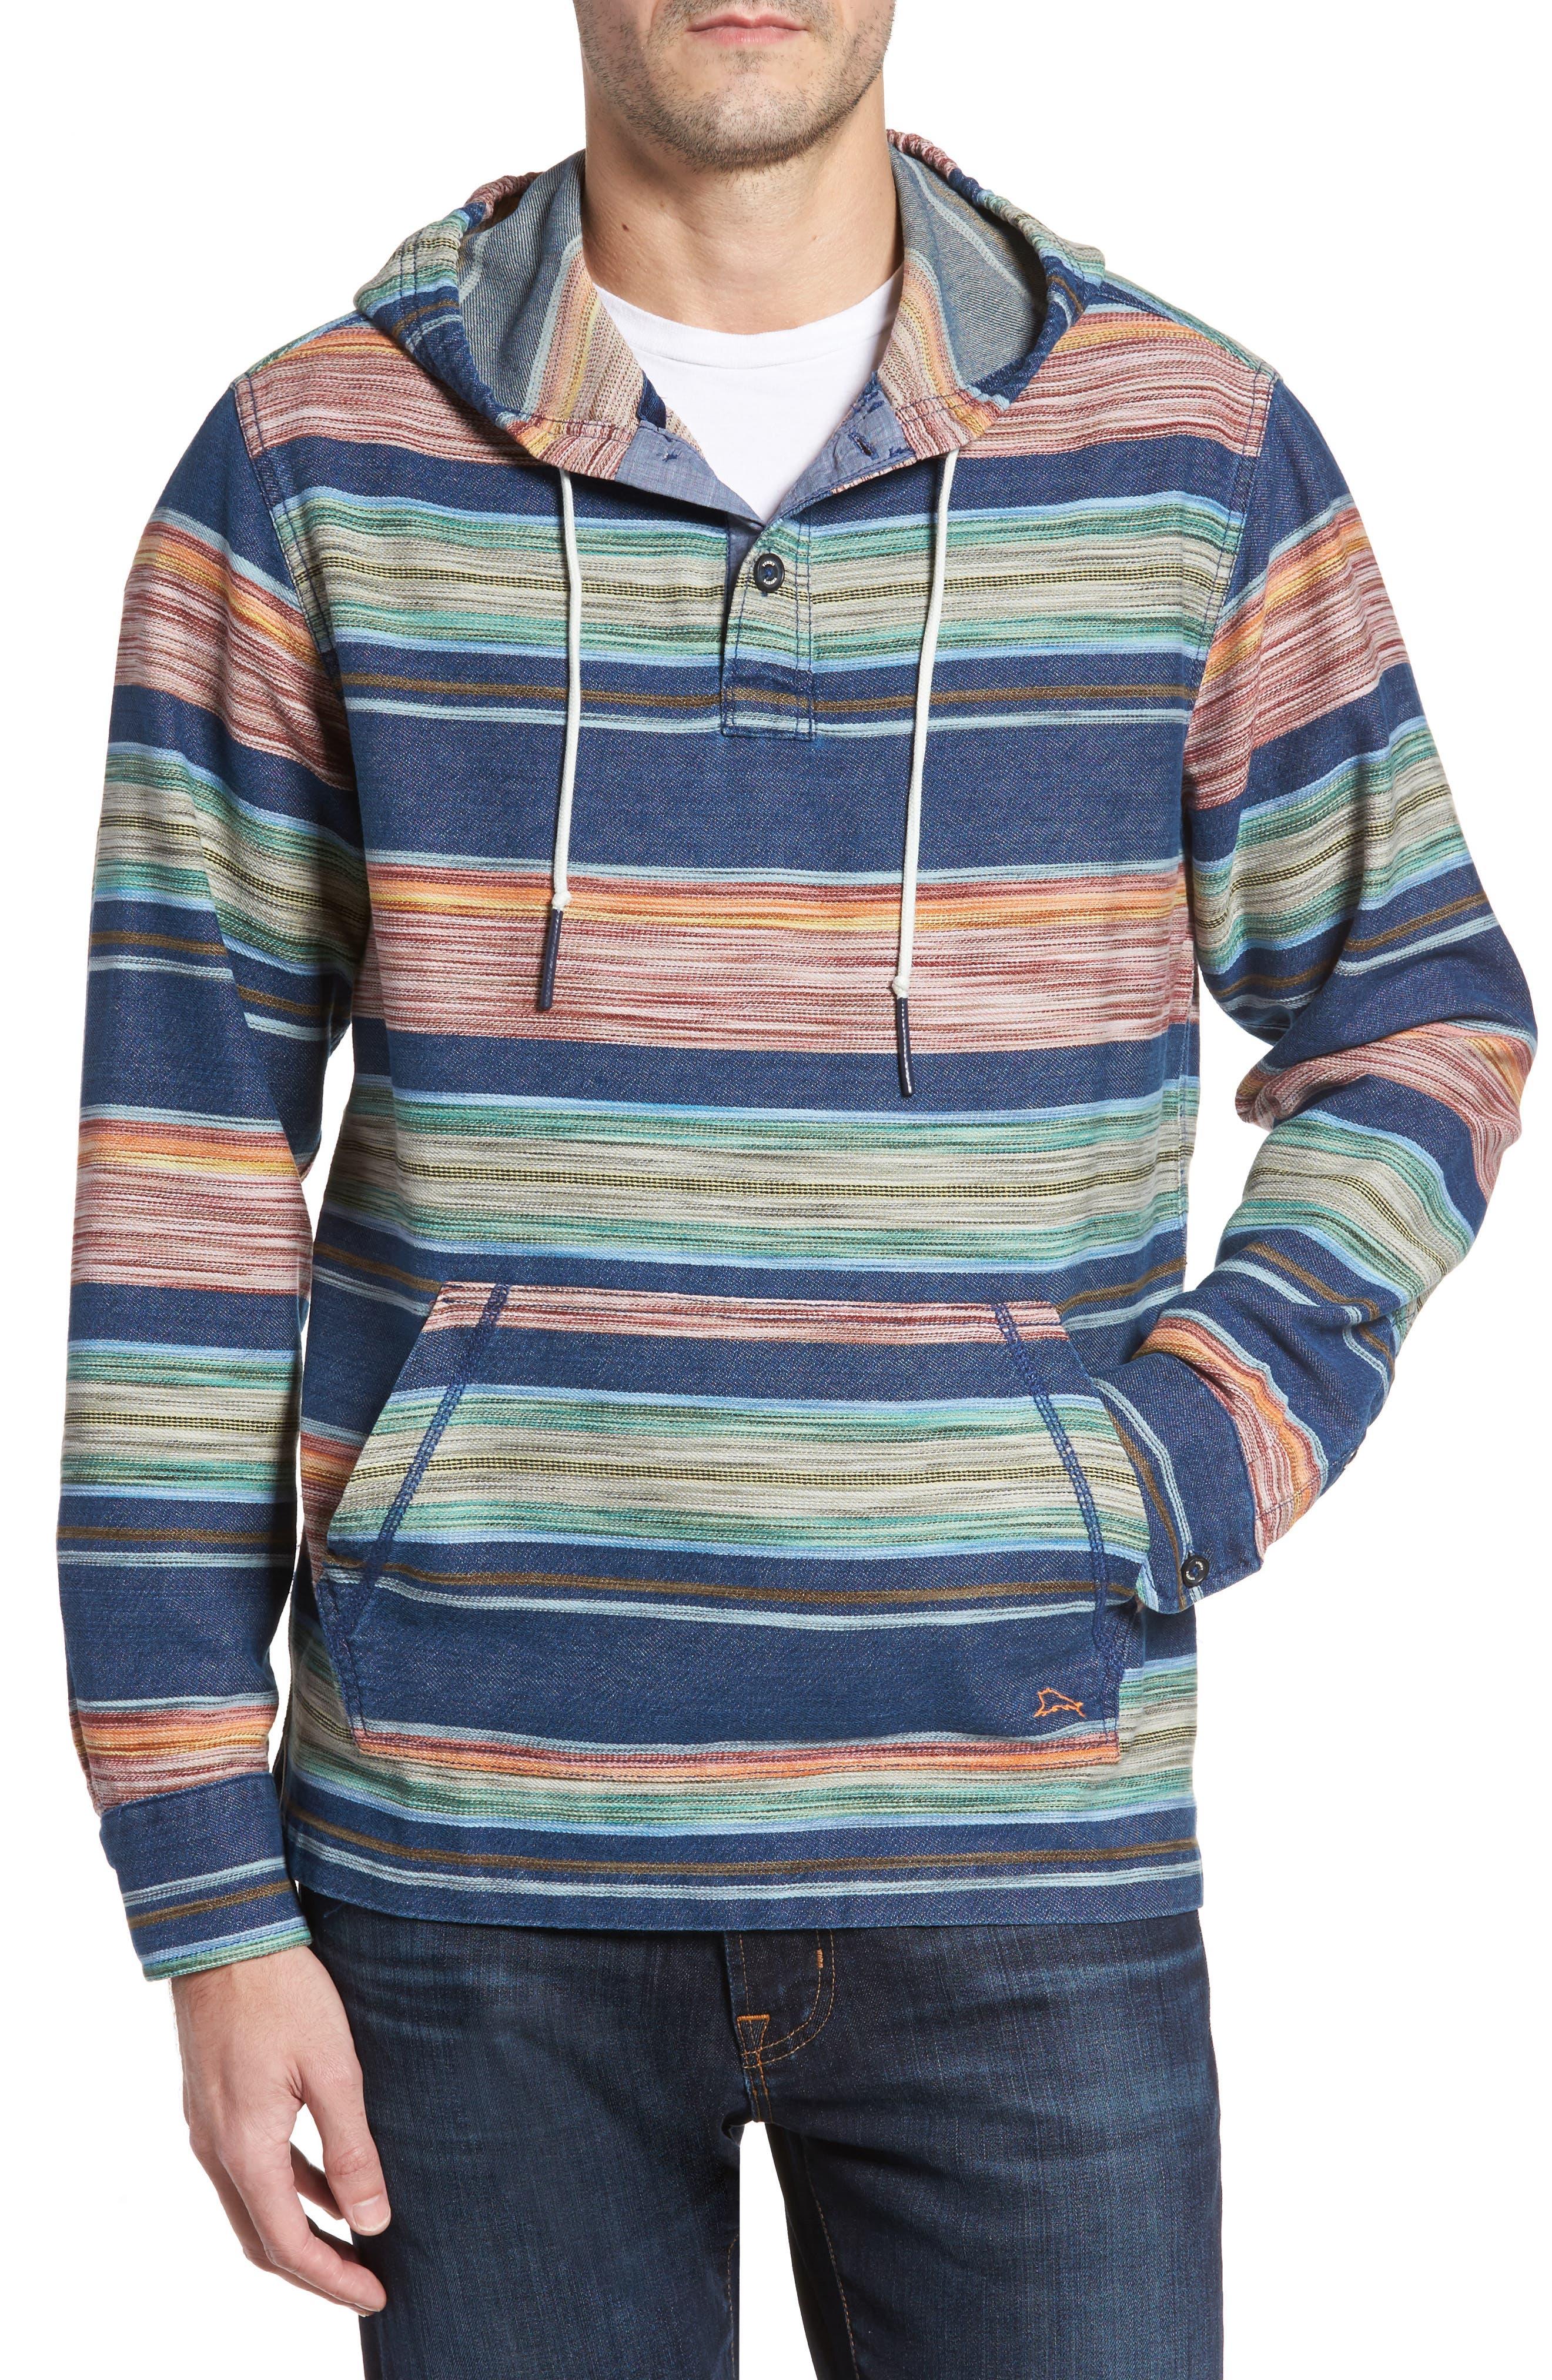 Alternate Image 1 Selected - Tommy Bahama Bahia Baja Stripe Hoodie